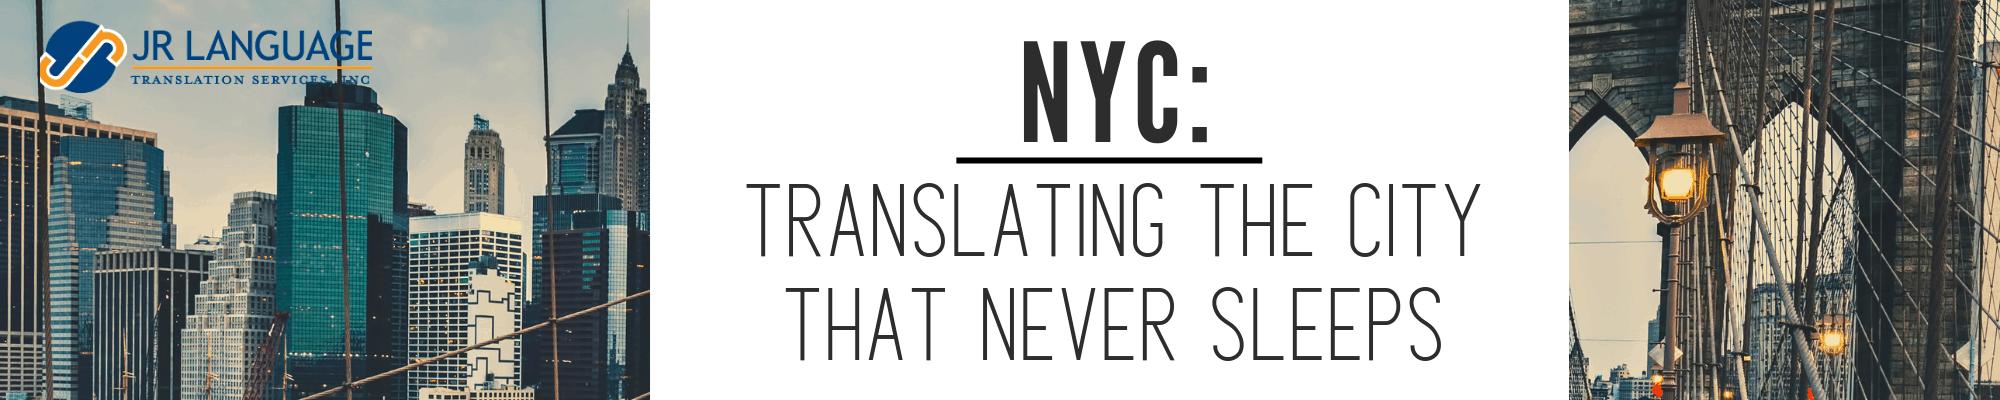 nyc translation services impact